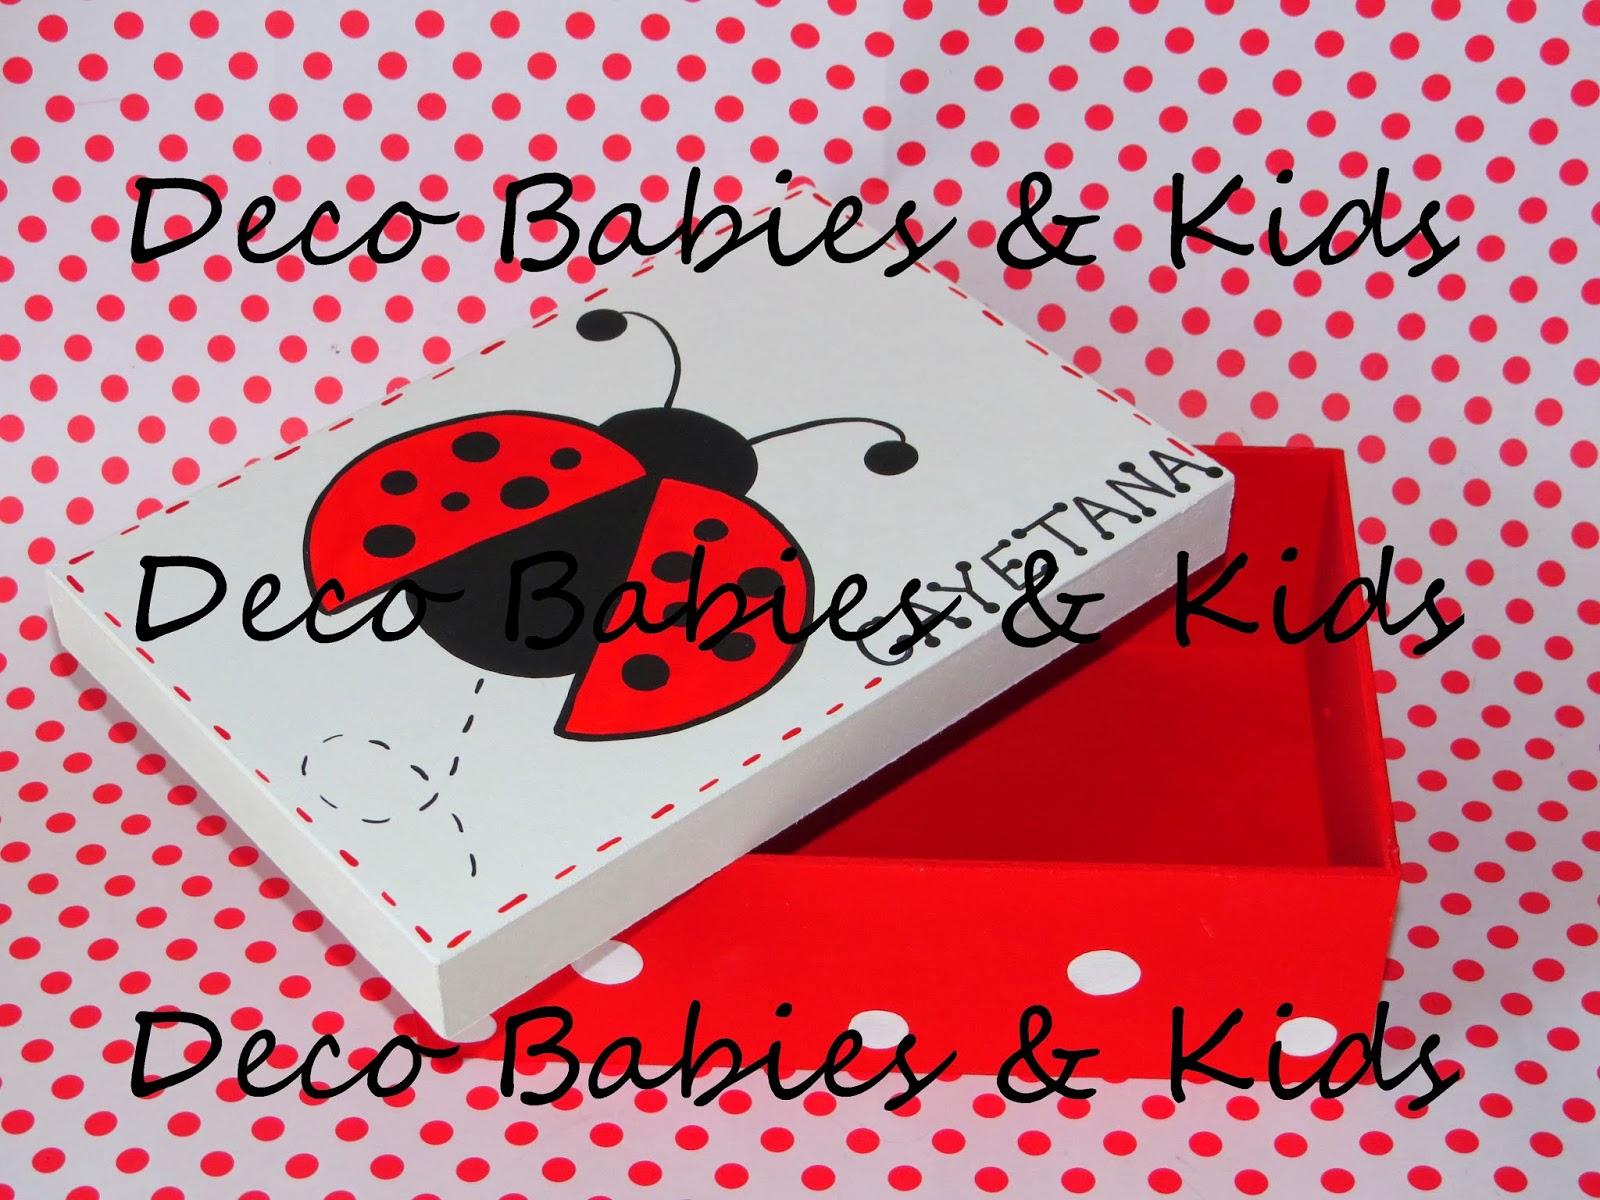 Deco babies kids 31 oct 2013 - Motivos infantiles para decorar ...